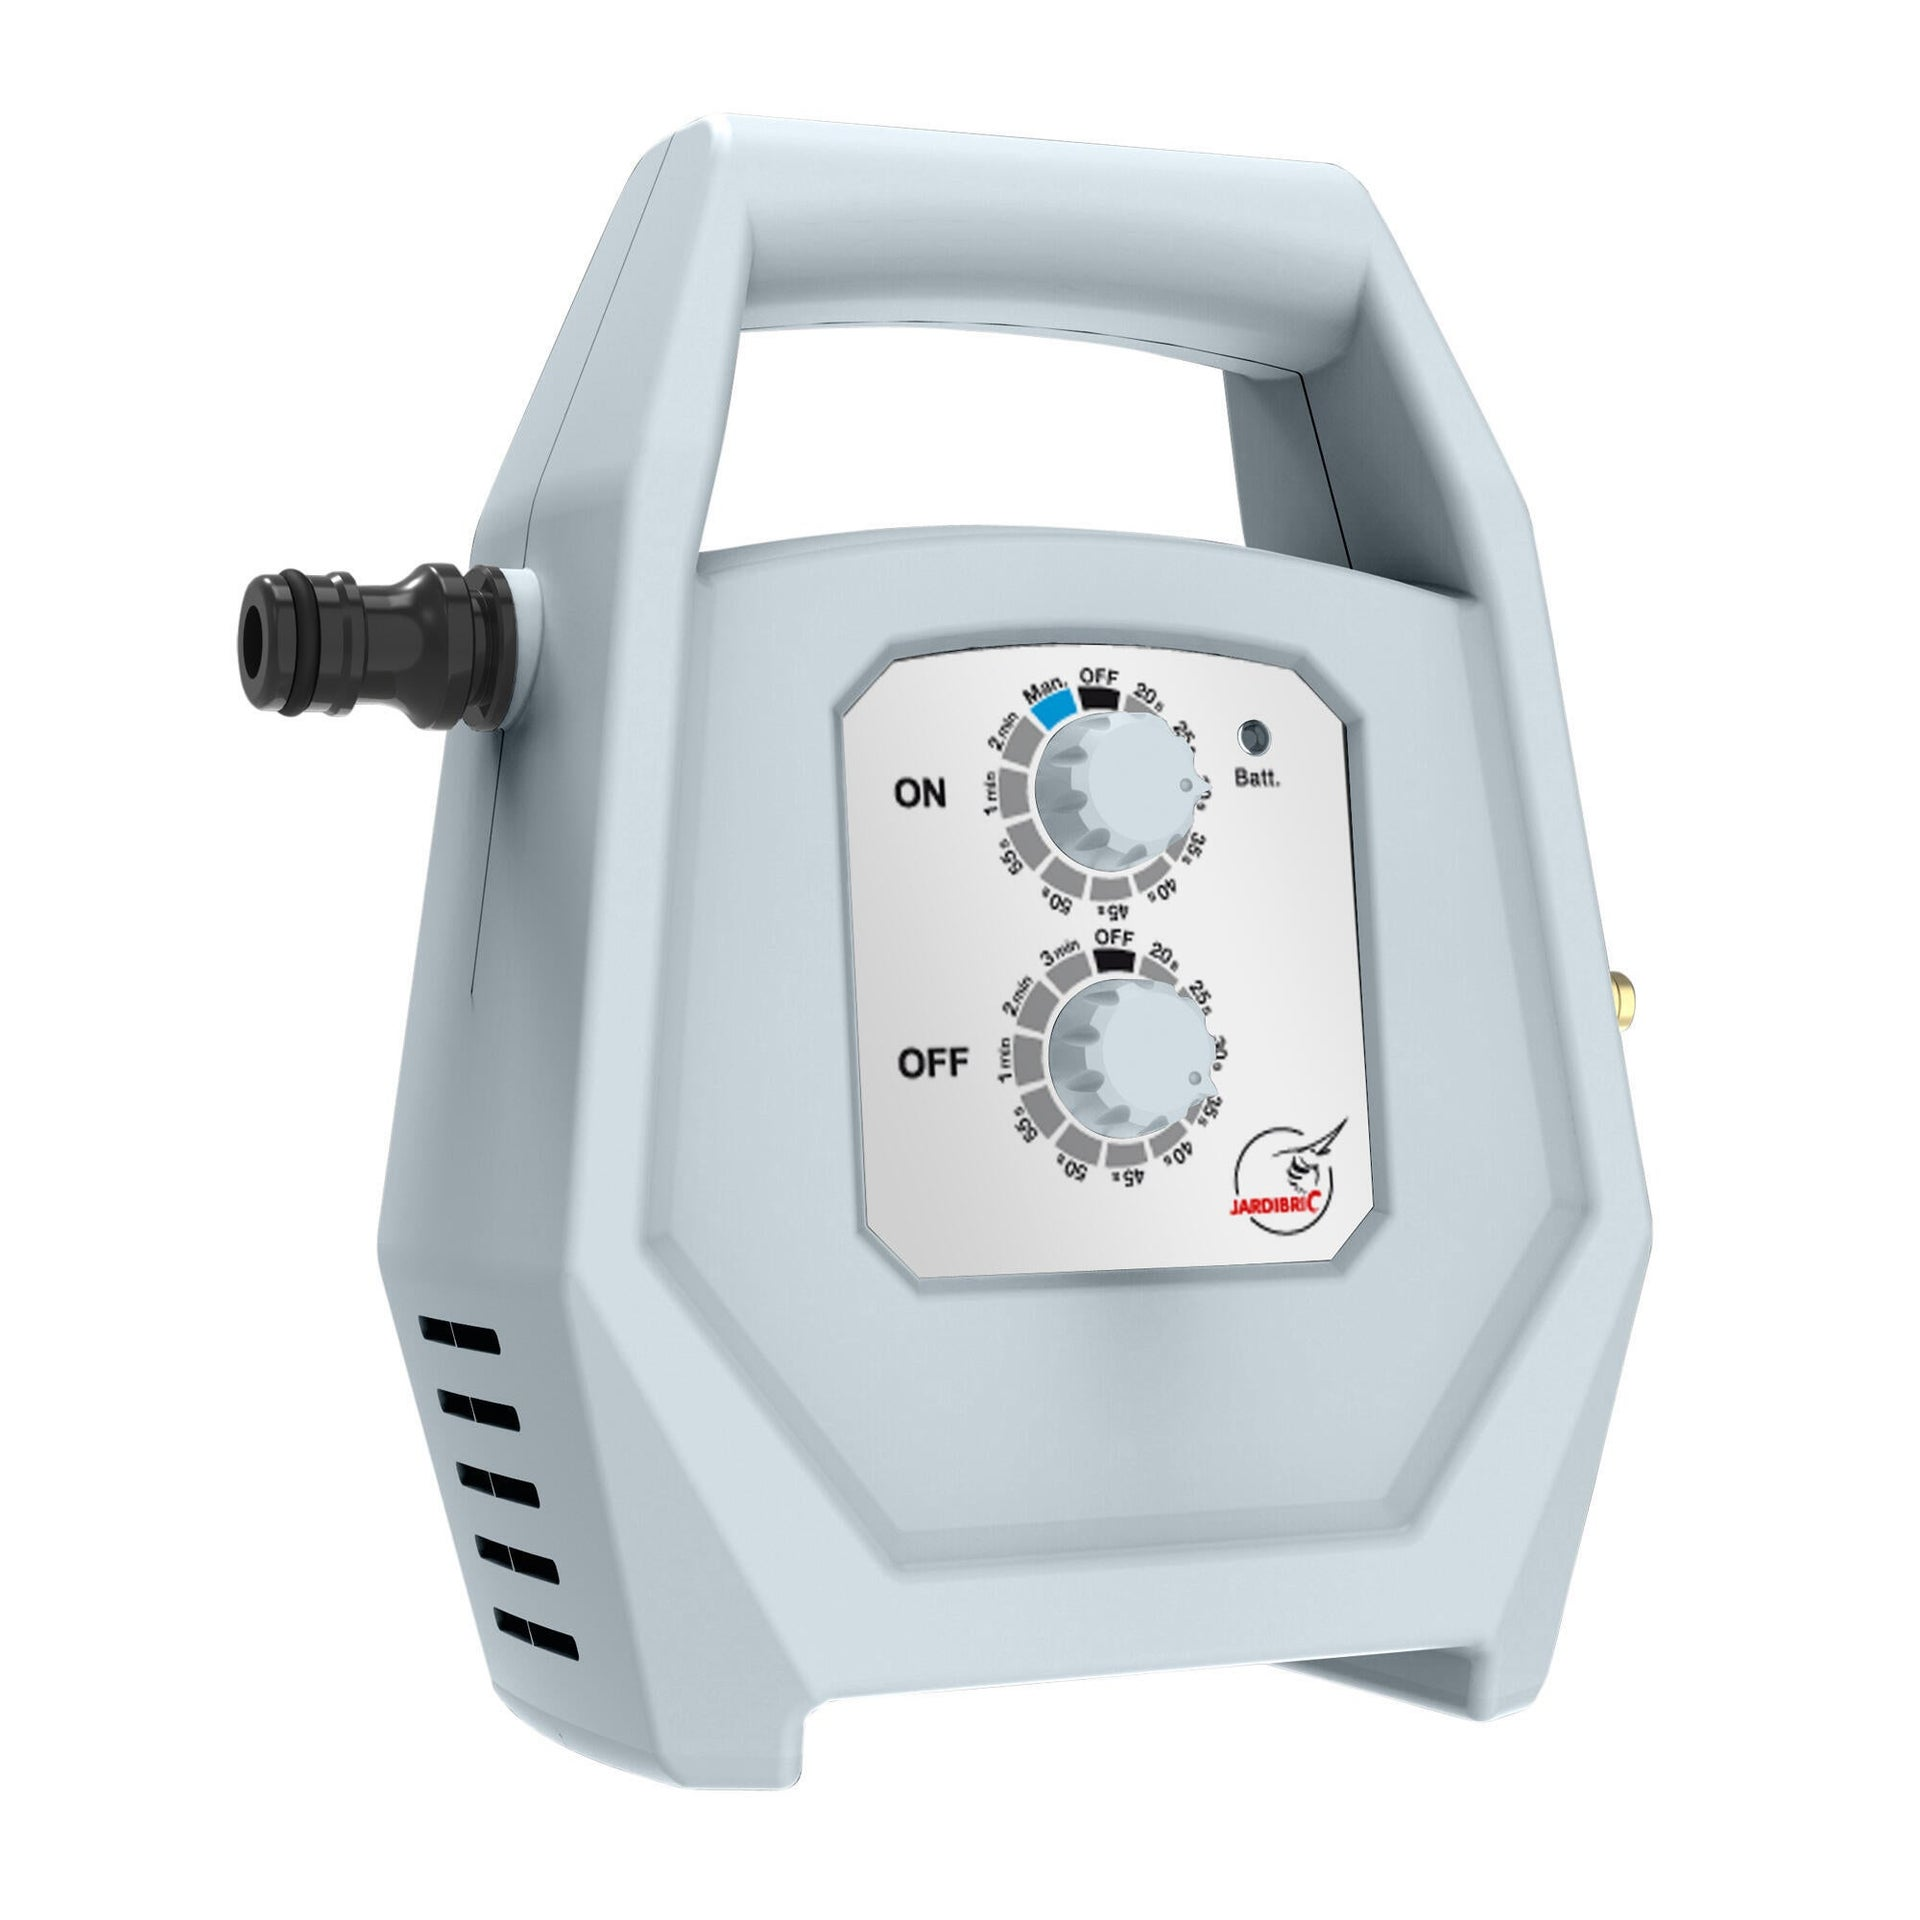 Kit nebulizzatore JARDIBRIC KPBRU20 - 1